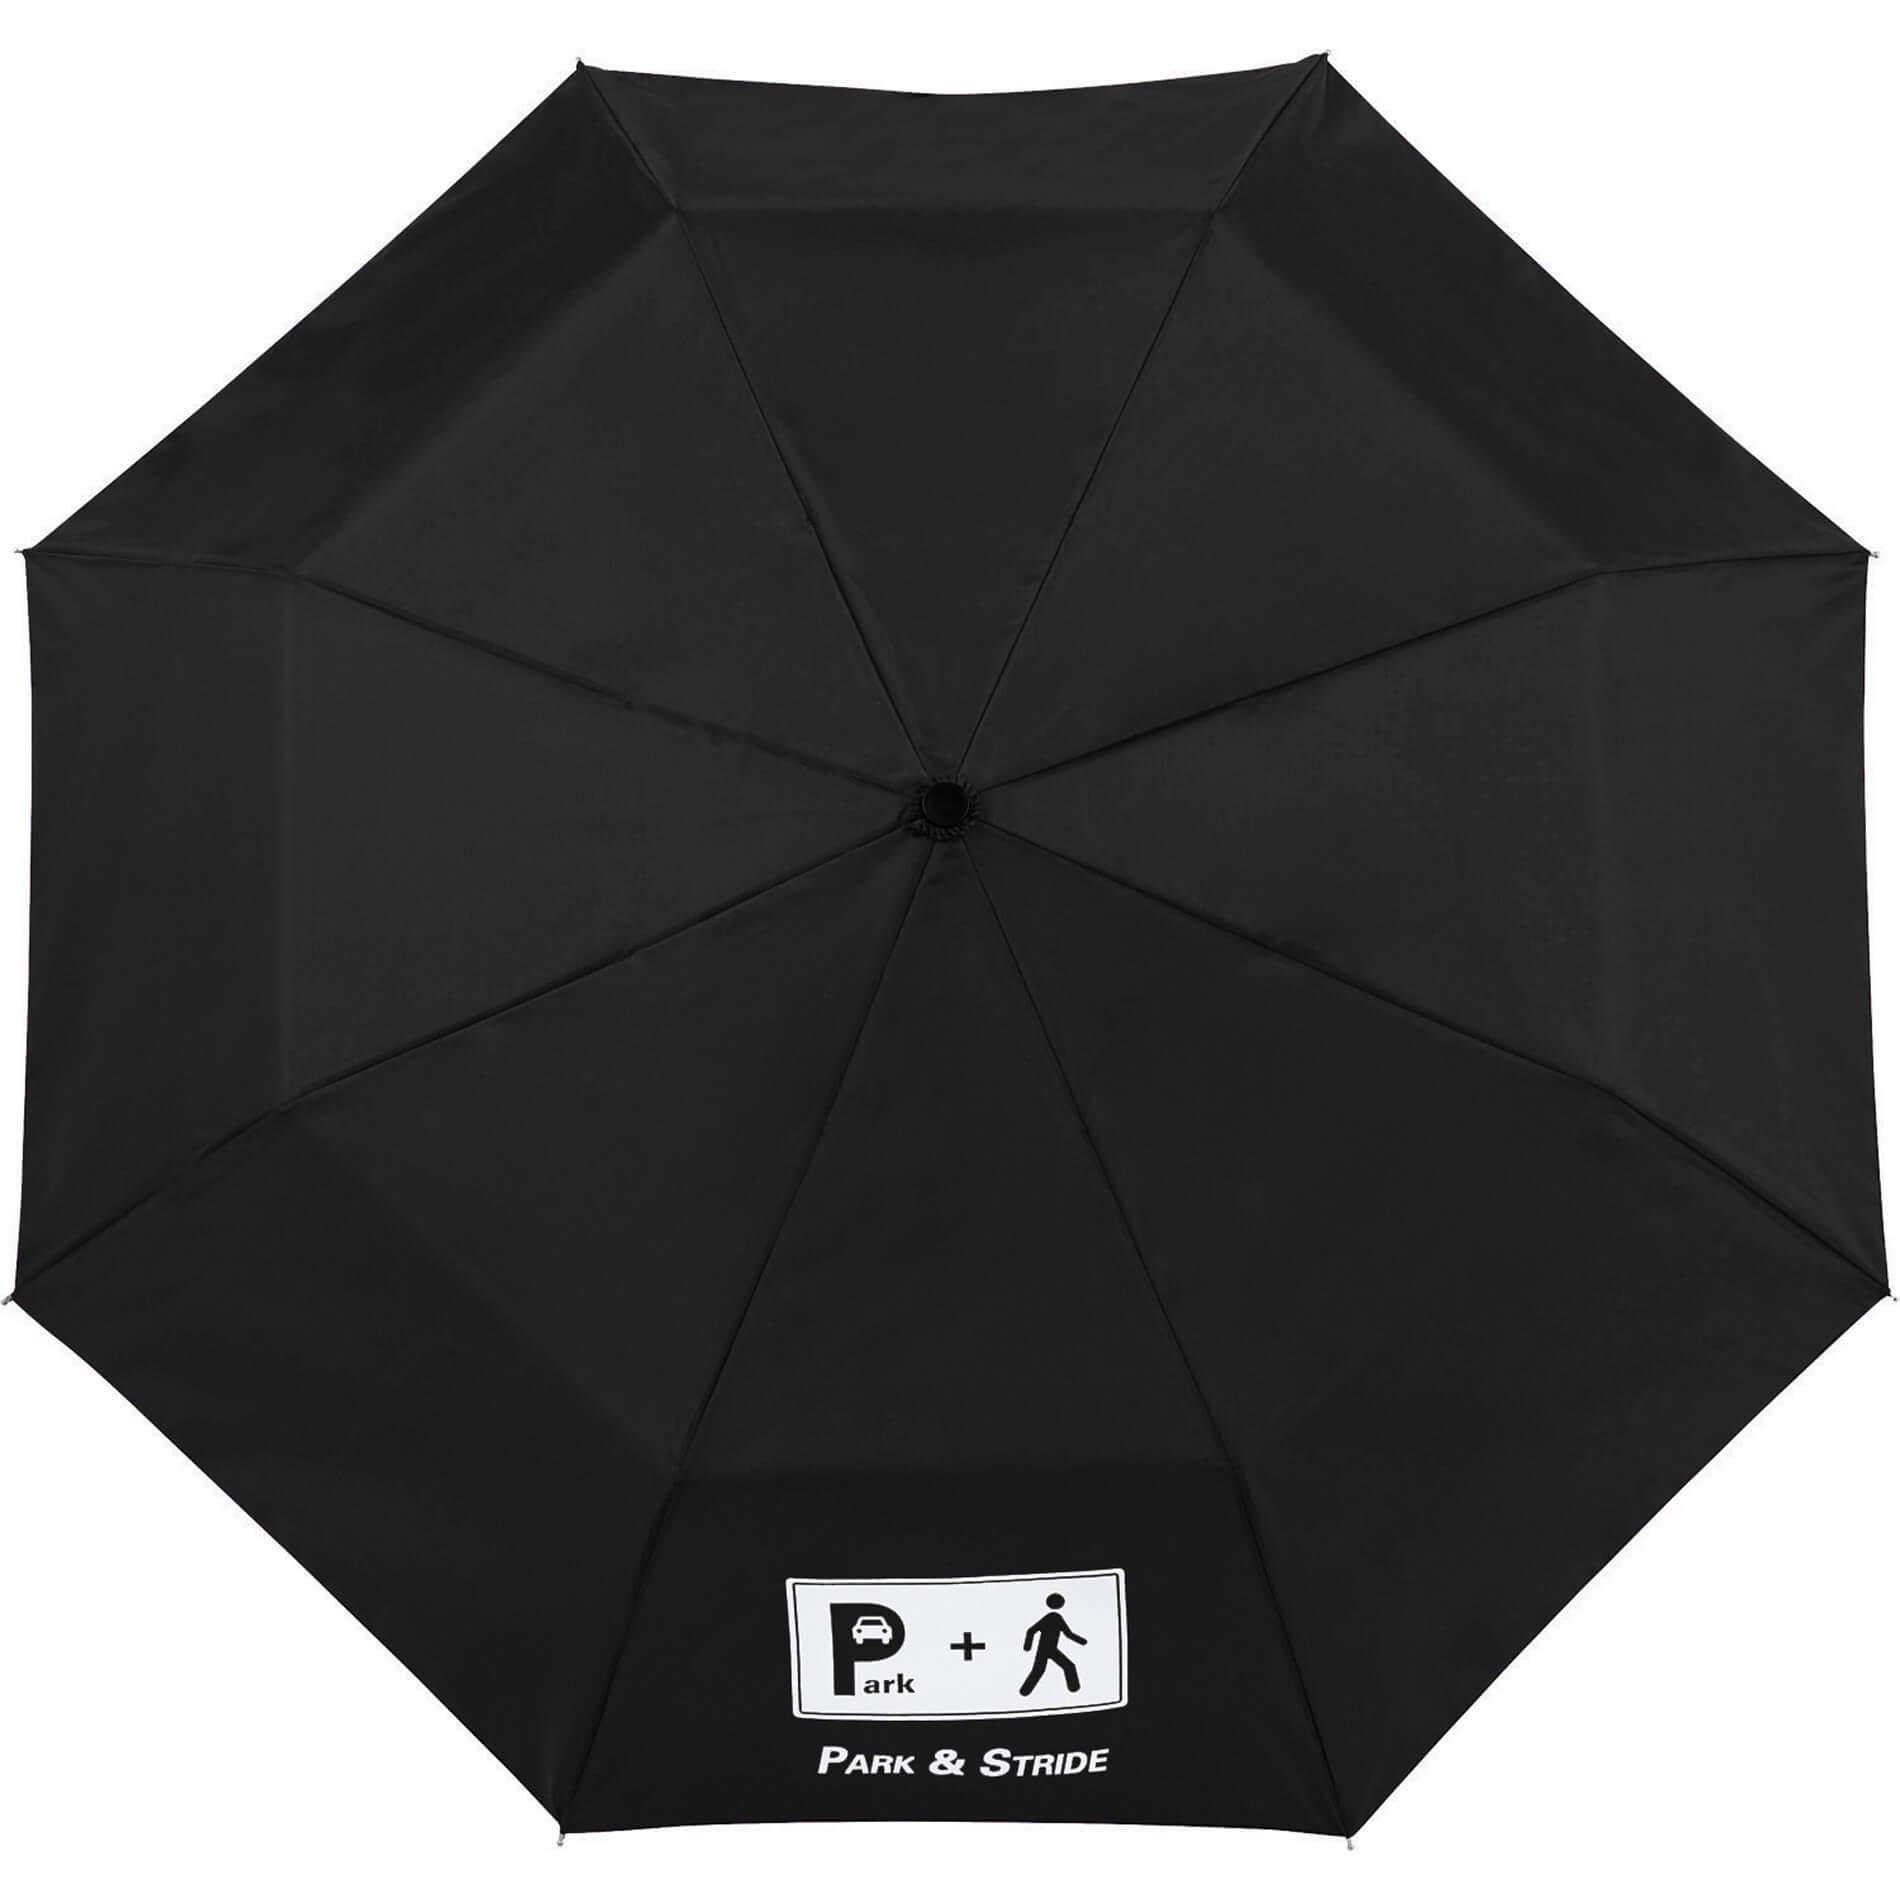 Umbrella-Black-Swag.com